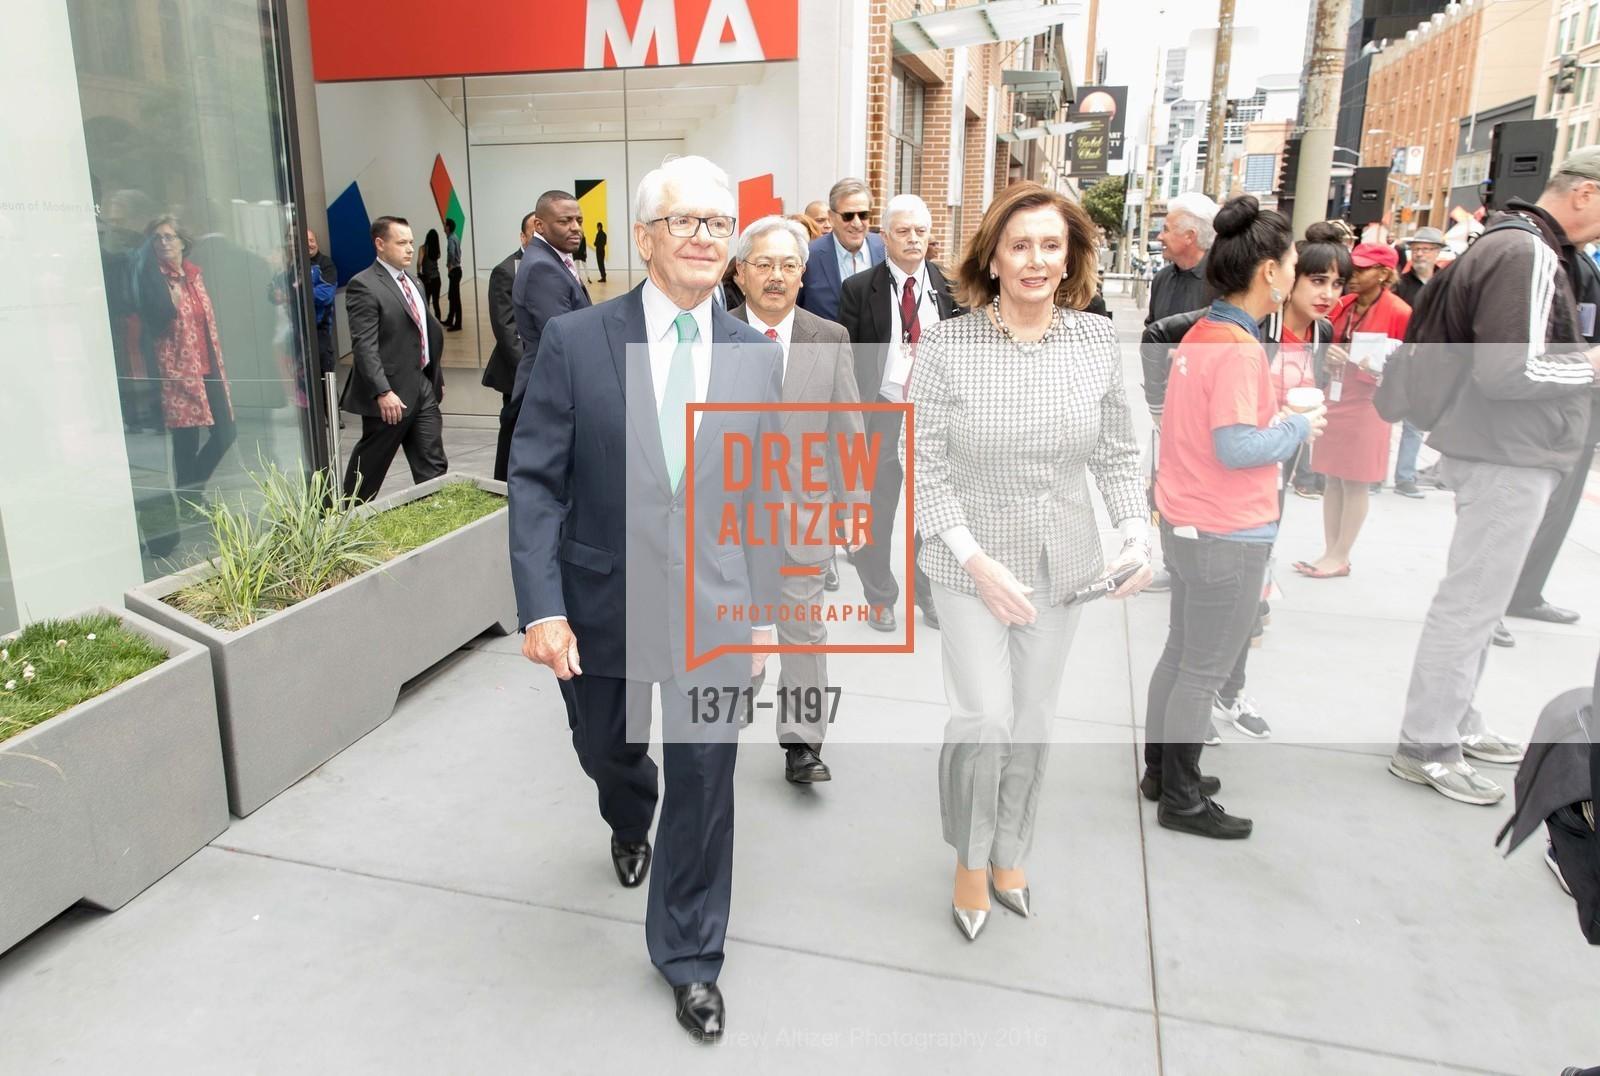 Charles Schwab, Nancy Pelosi, Photo #1371-1197